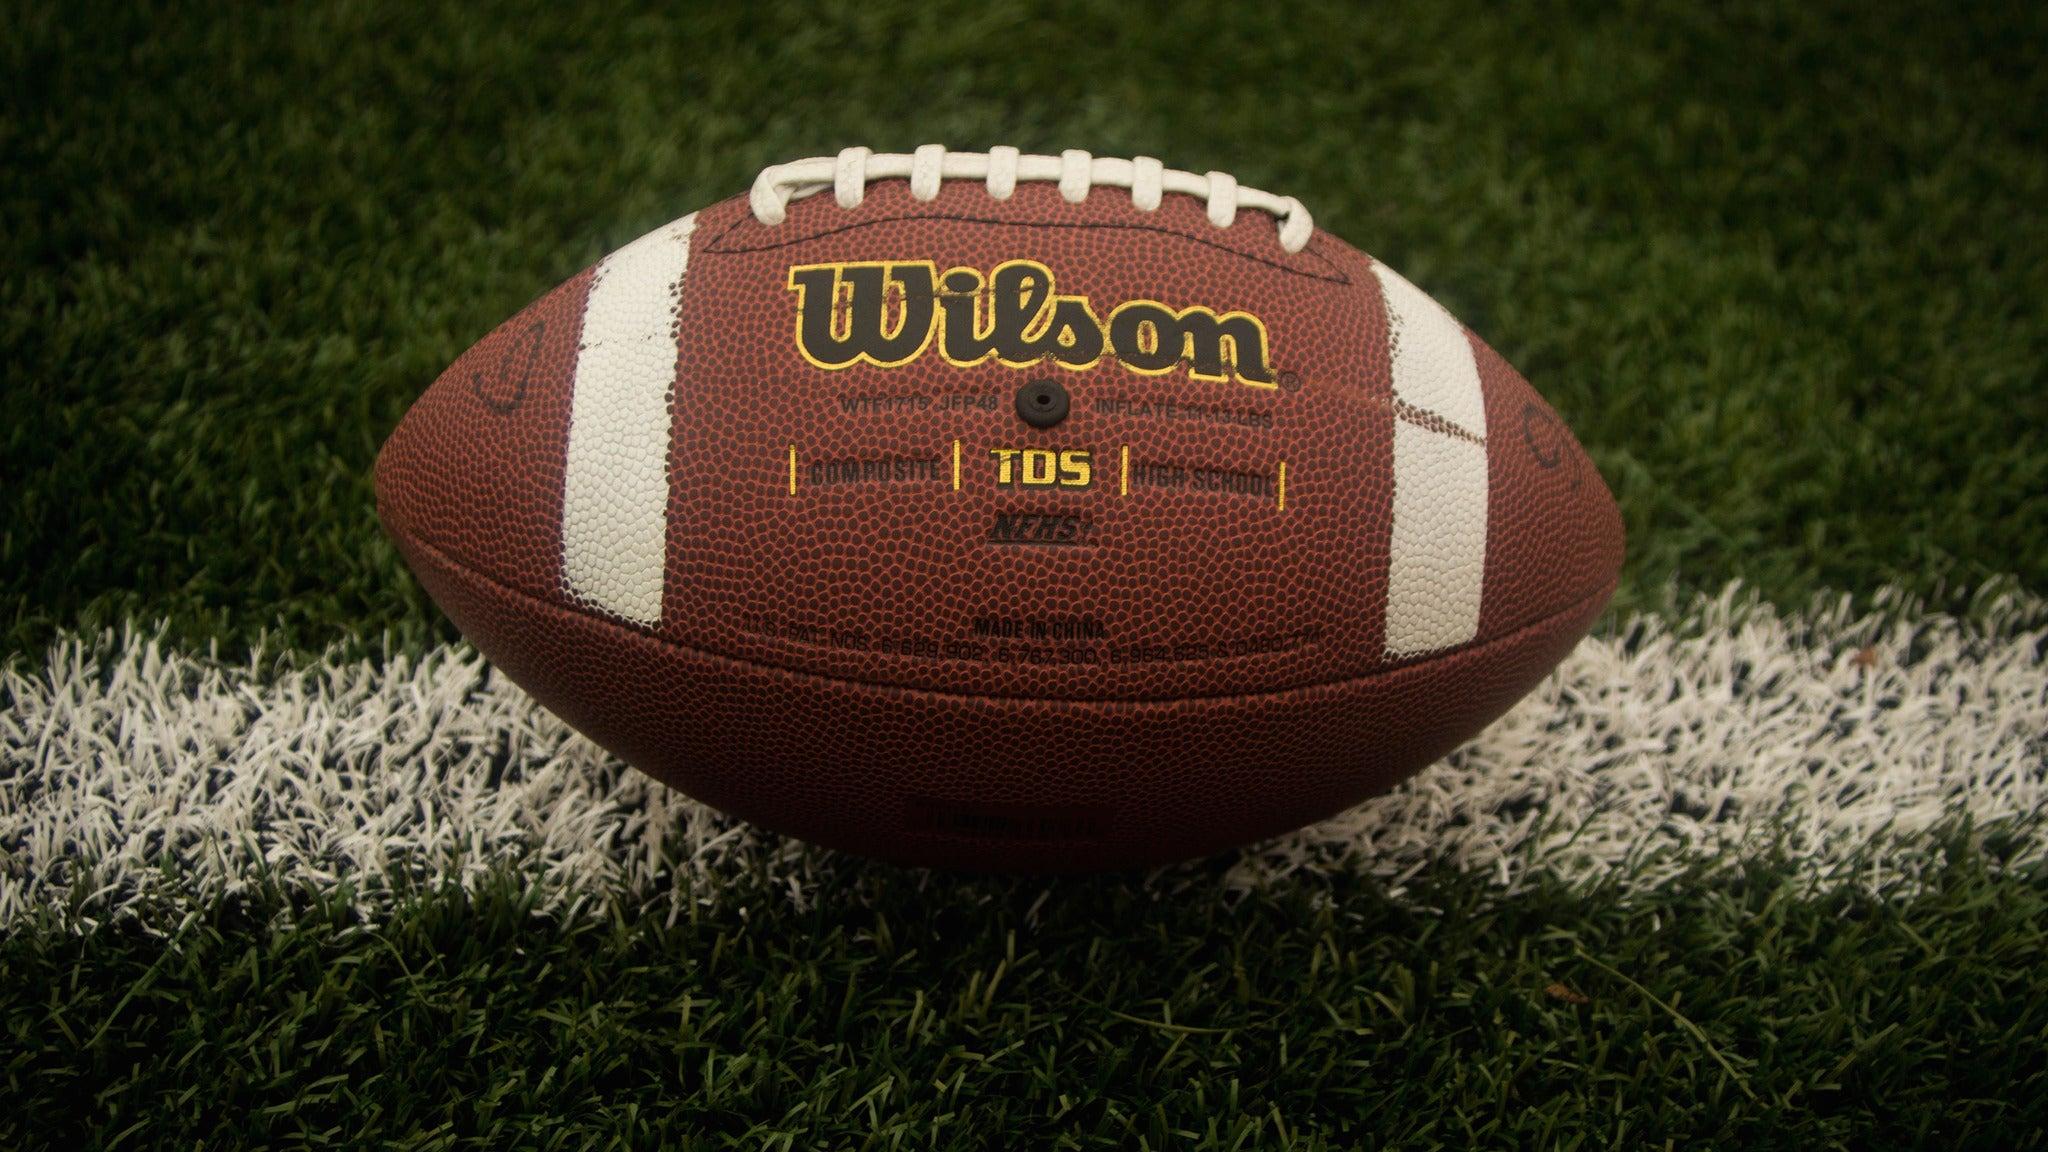 Auburn Tigers Football at Clemson Tigers Football